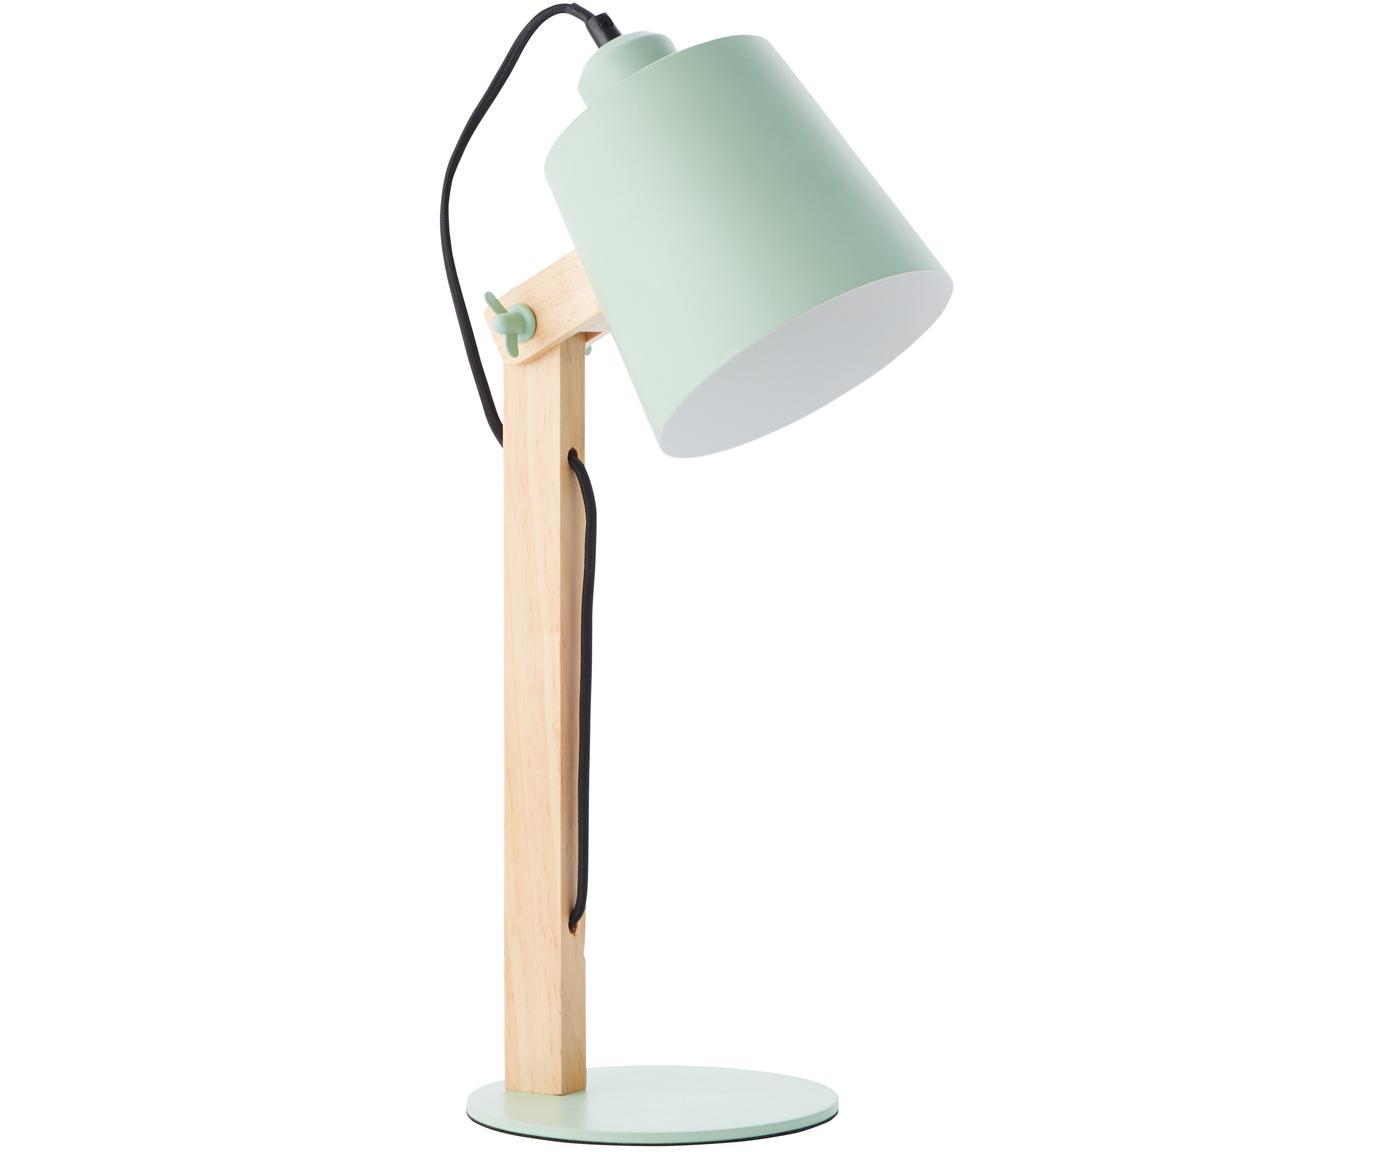 Schreibtischlampe Swivel mit Holzfuß, Lampenschirm: Metall, Stange: Holz, Lampenfuß: Metall, Mintgrün, Holz, 16 x 52 cm